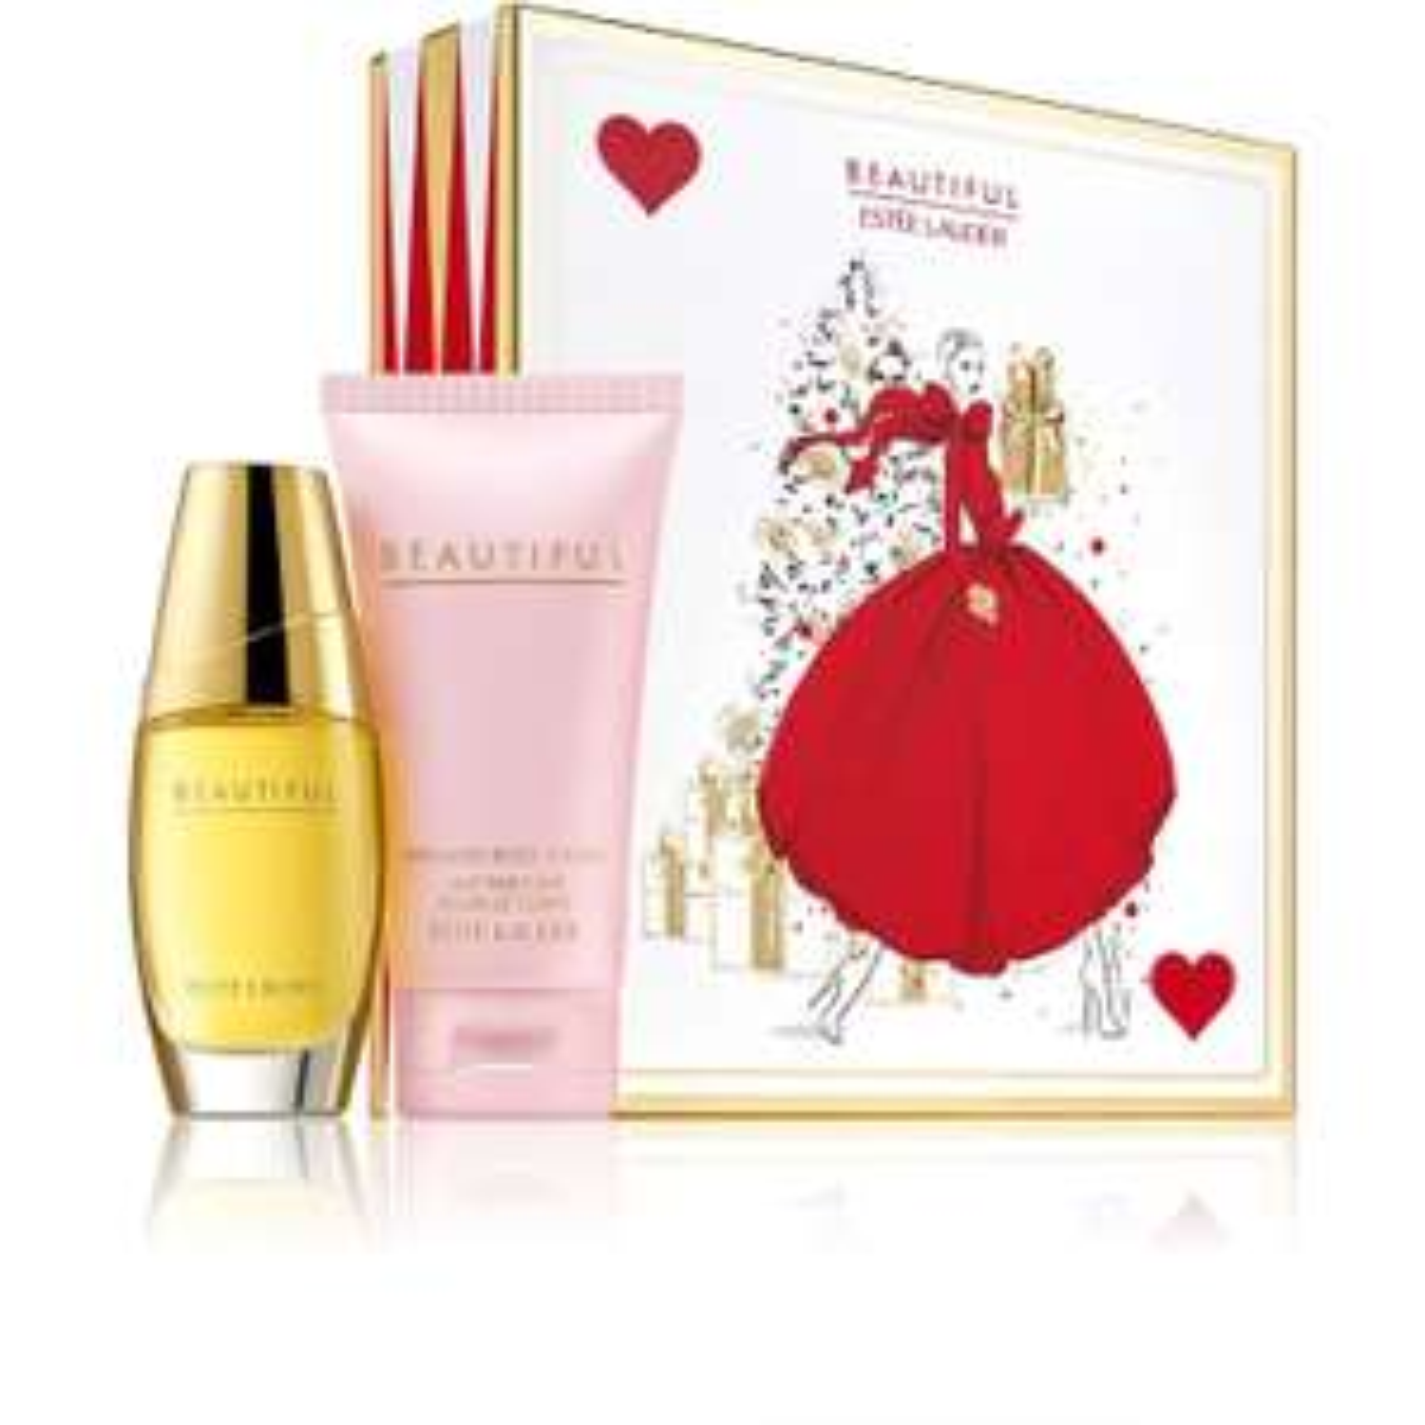 Estee lauder beautiful Ltd edn gift set - £30.66 @ Debenhams (Free Delivery )